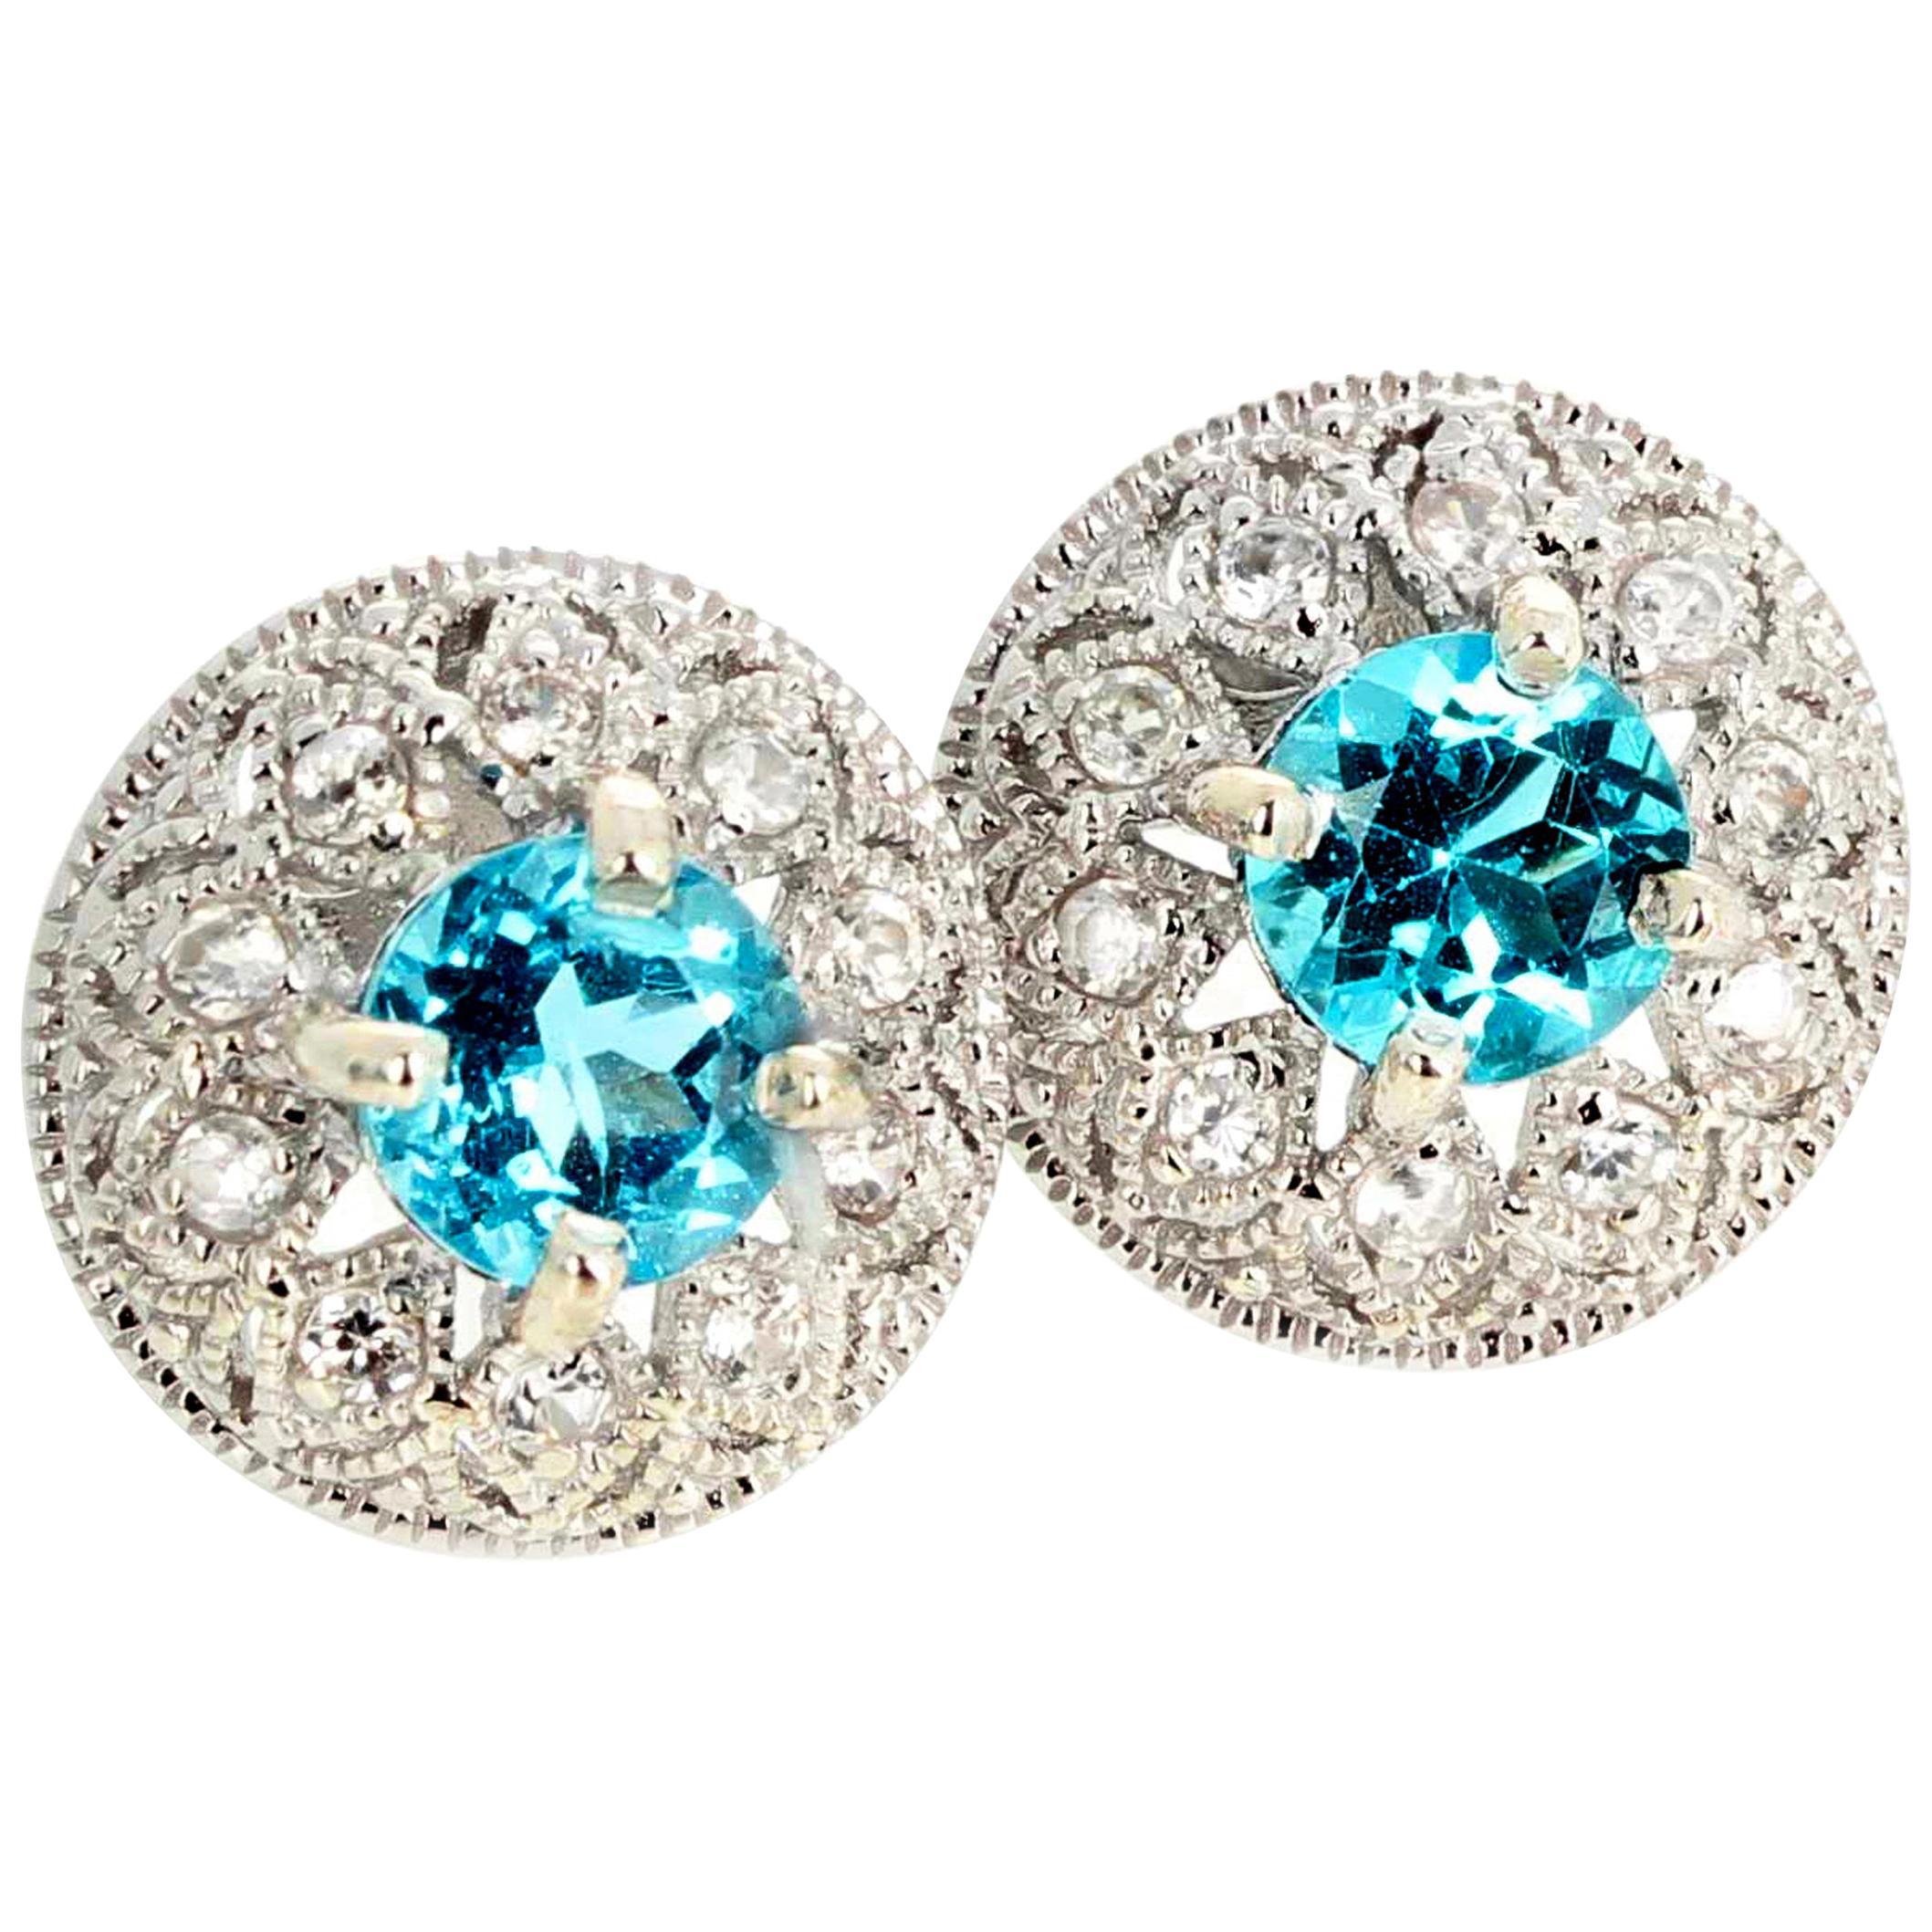 Gemjunky Sparkling Bright 1.82 Ct Intense Blue Topaz and Diamond Stud Earrings